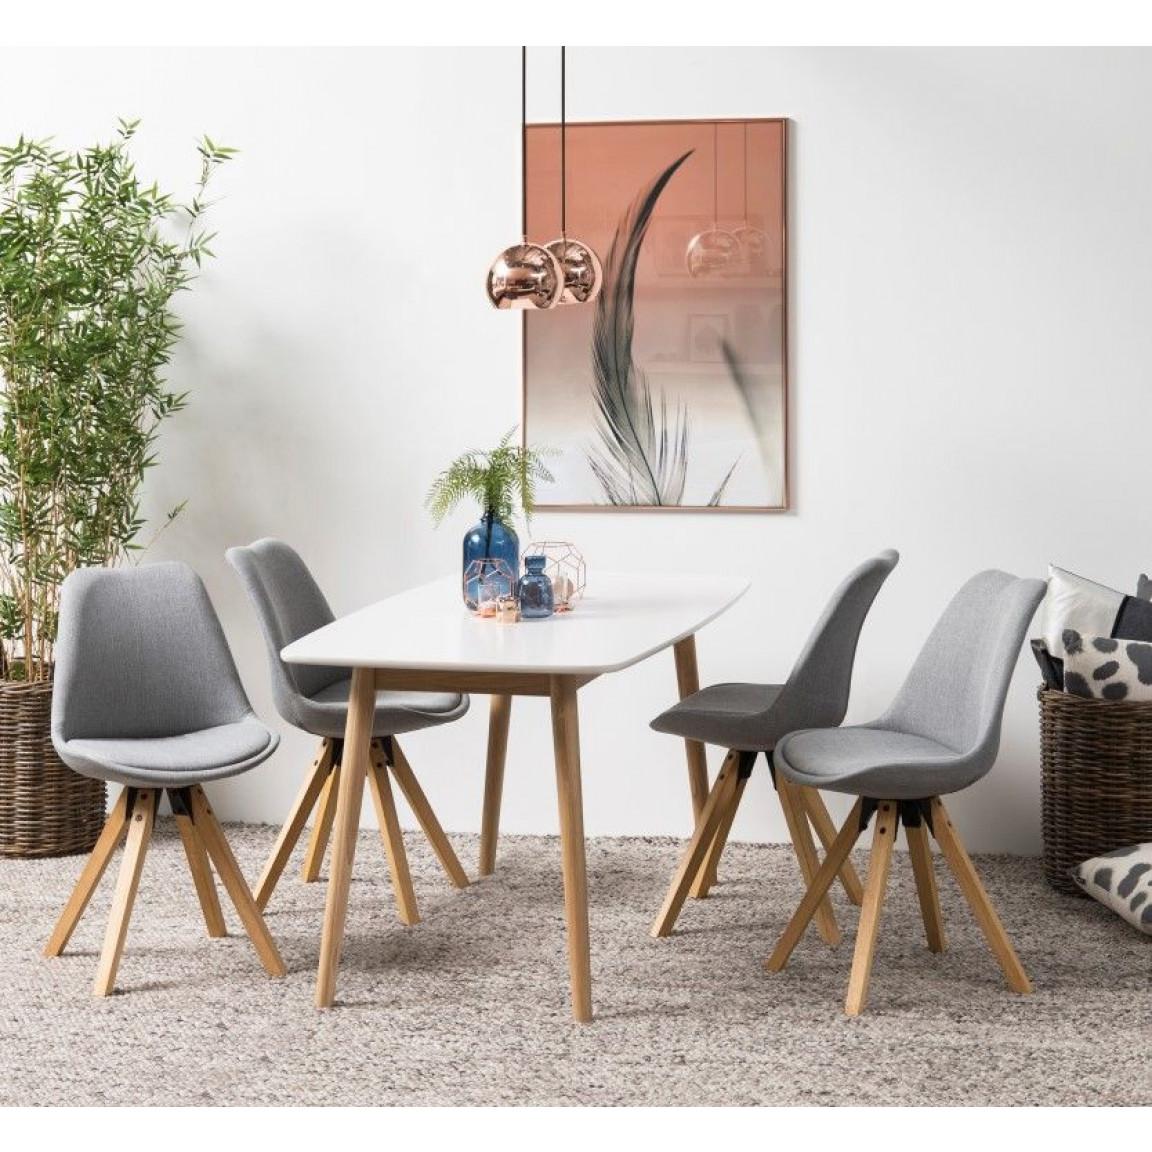 Set of 2 Chairs Nida | Black